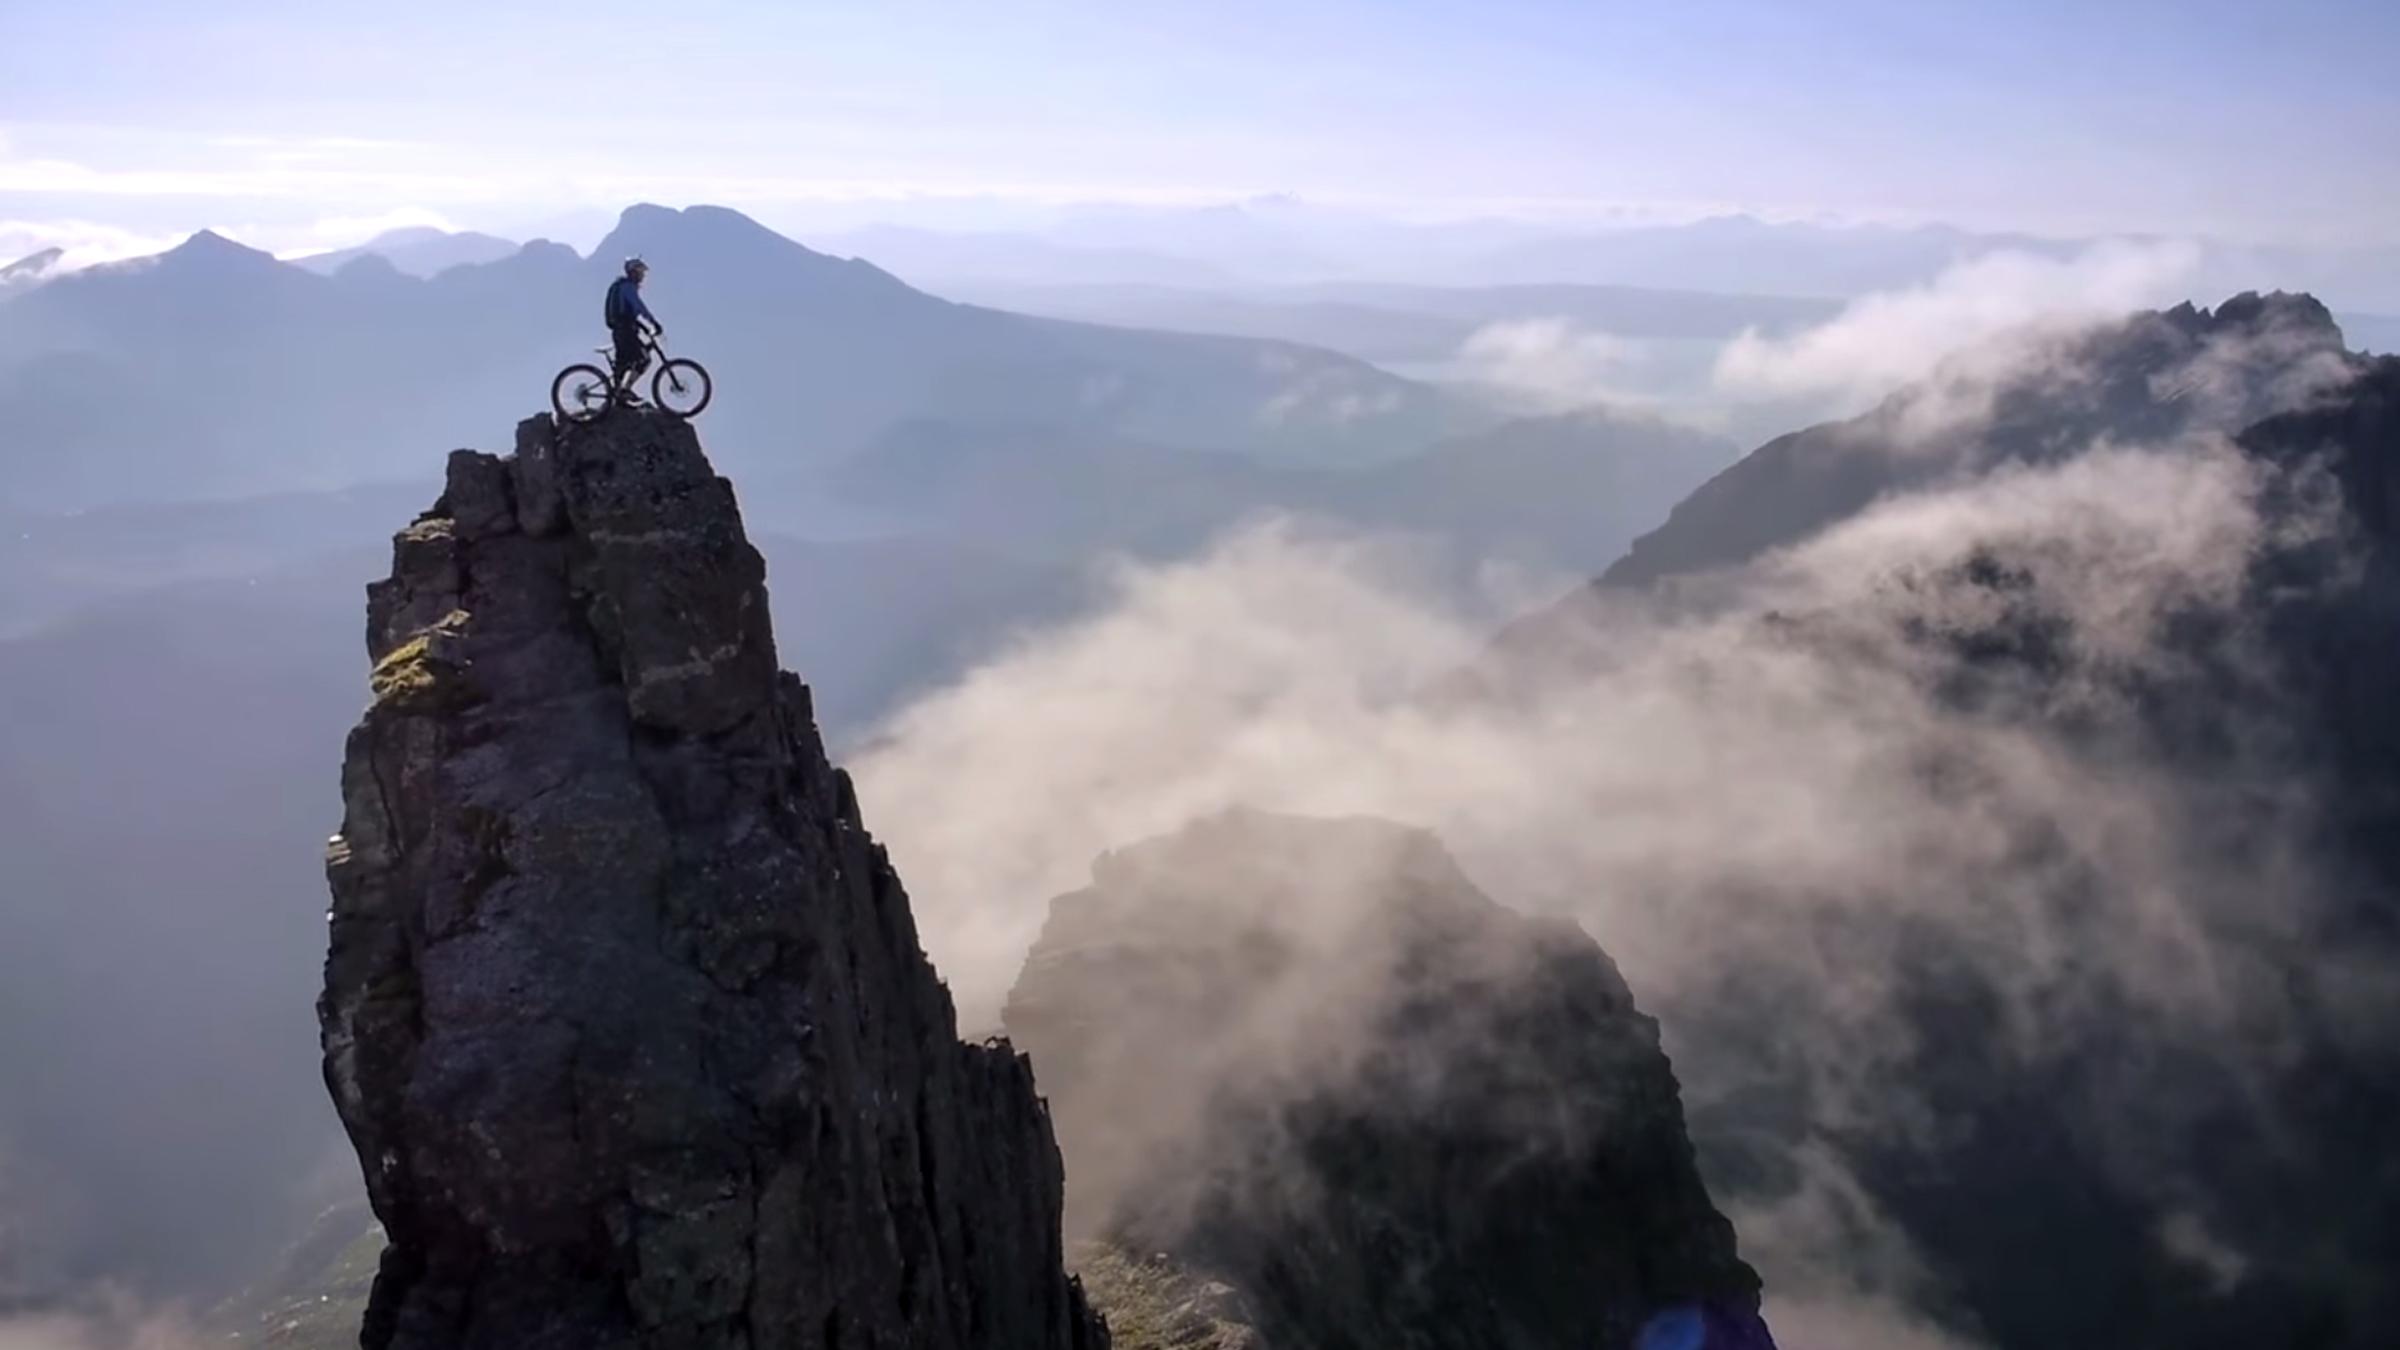 Macaskill hails from Scotland's Isle of Skye. https://www.youtube.com/watch?v=xQ_IQS3VKjA